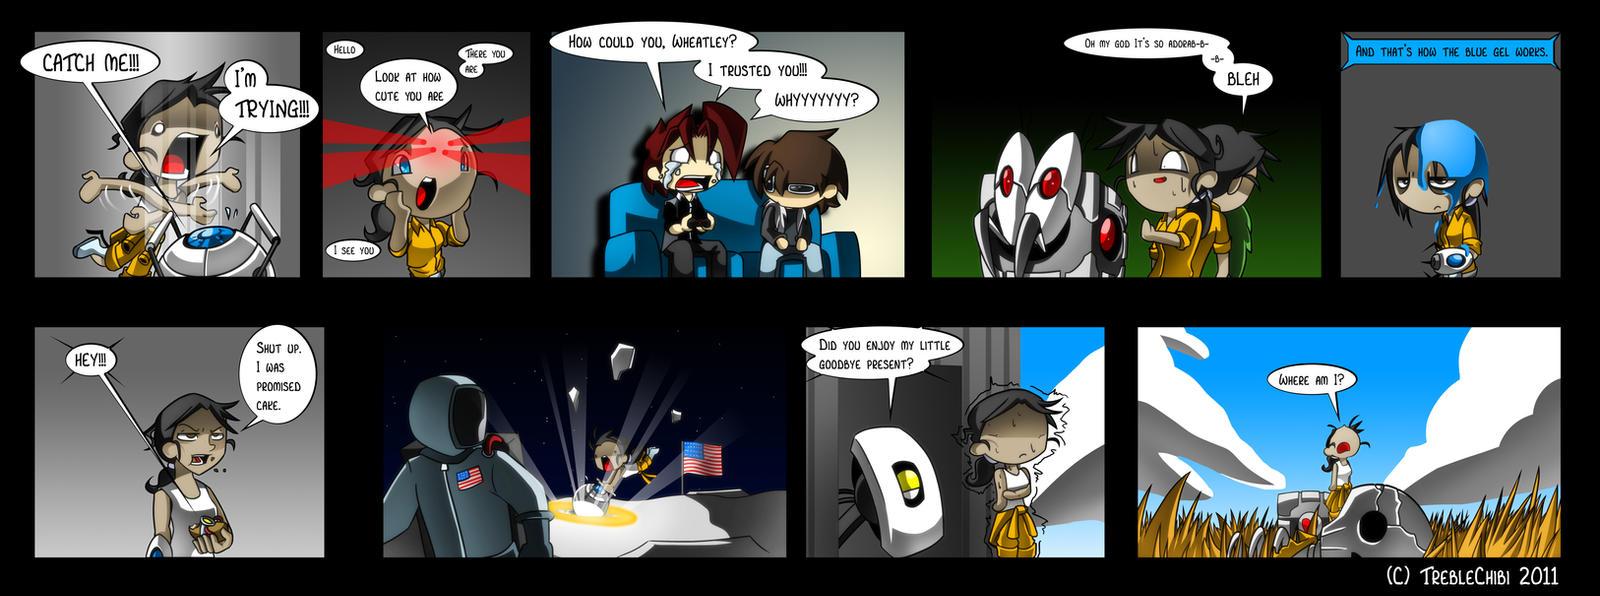 Portal 2 by DukeStewart